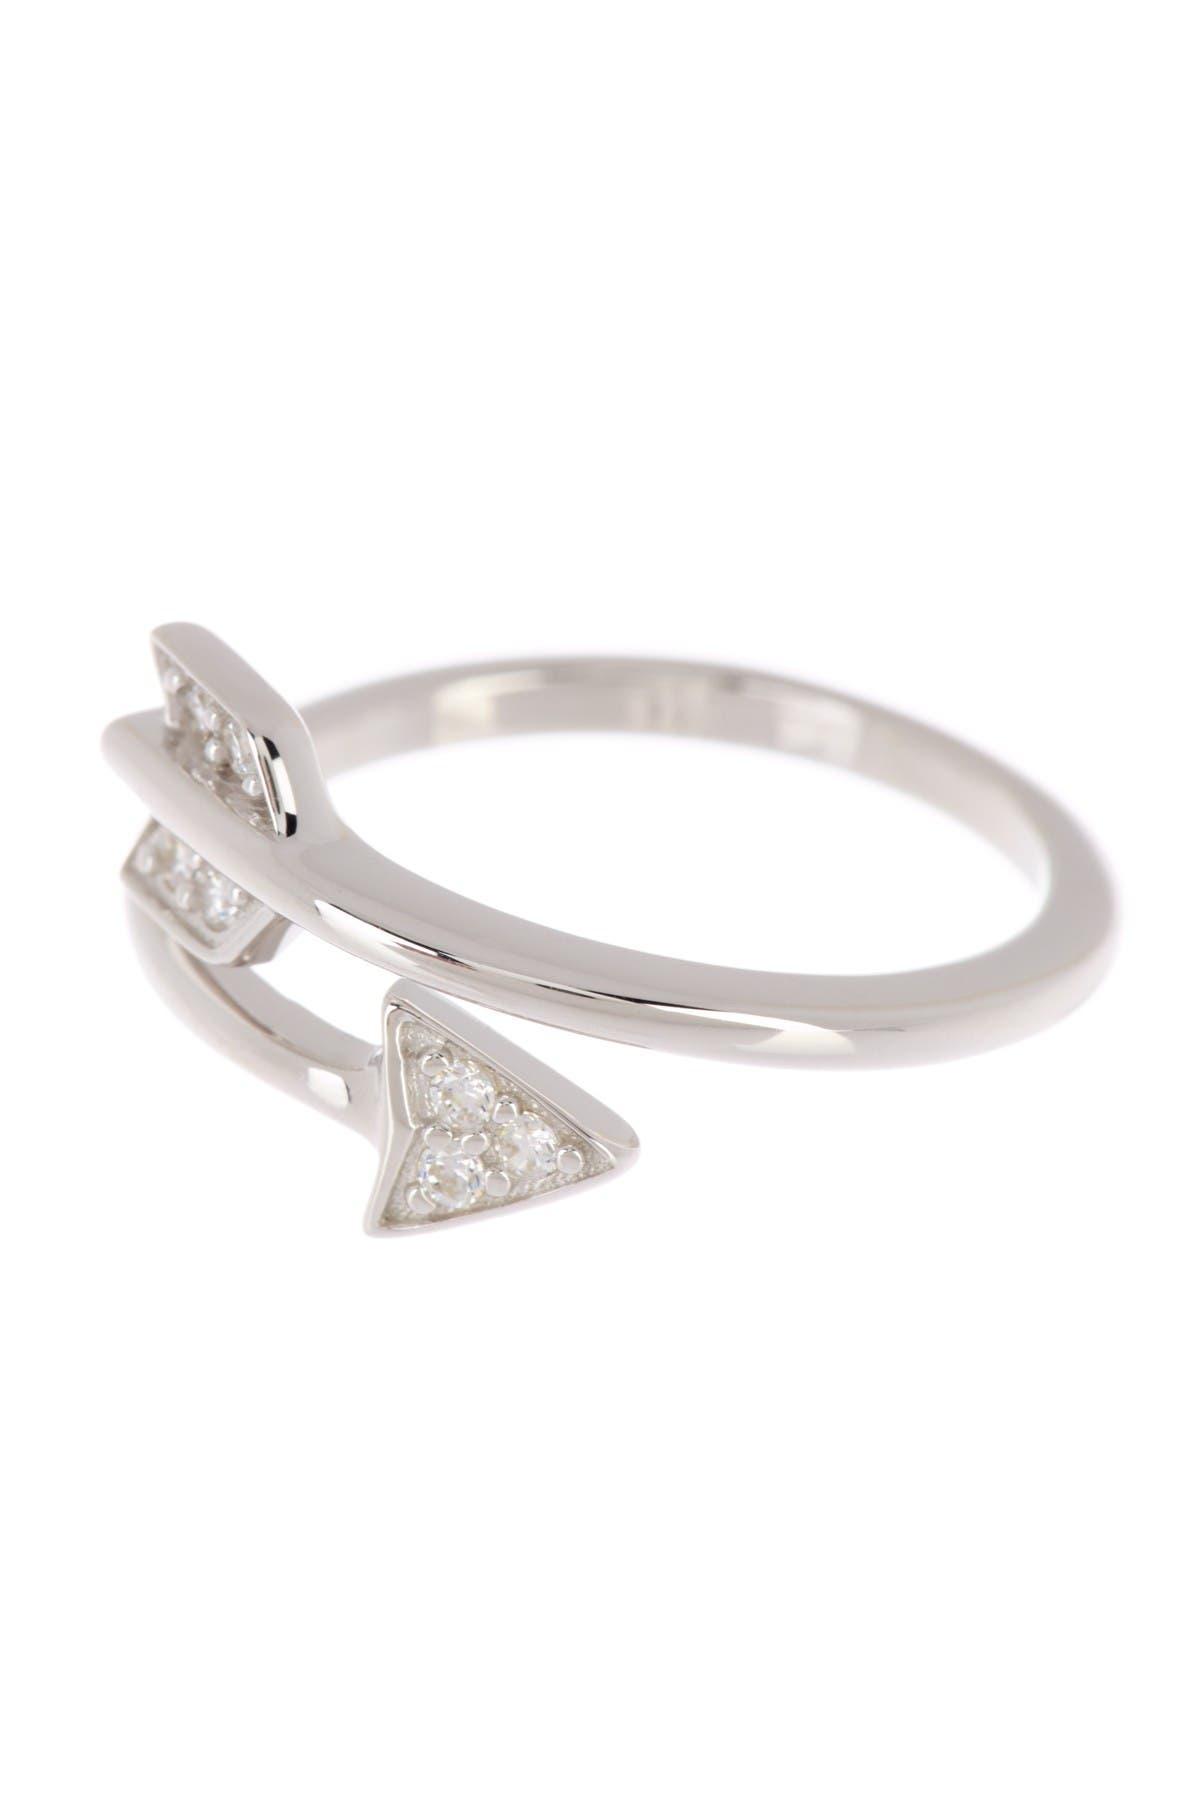 Ring ankle ring fine Ros\u00e9 gold Gr 52 stack ring